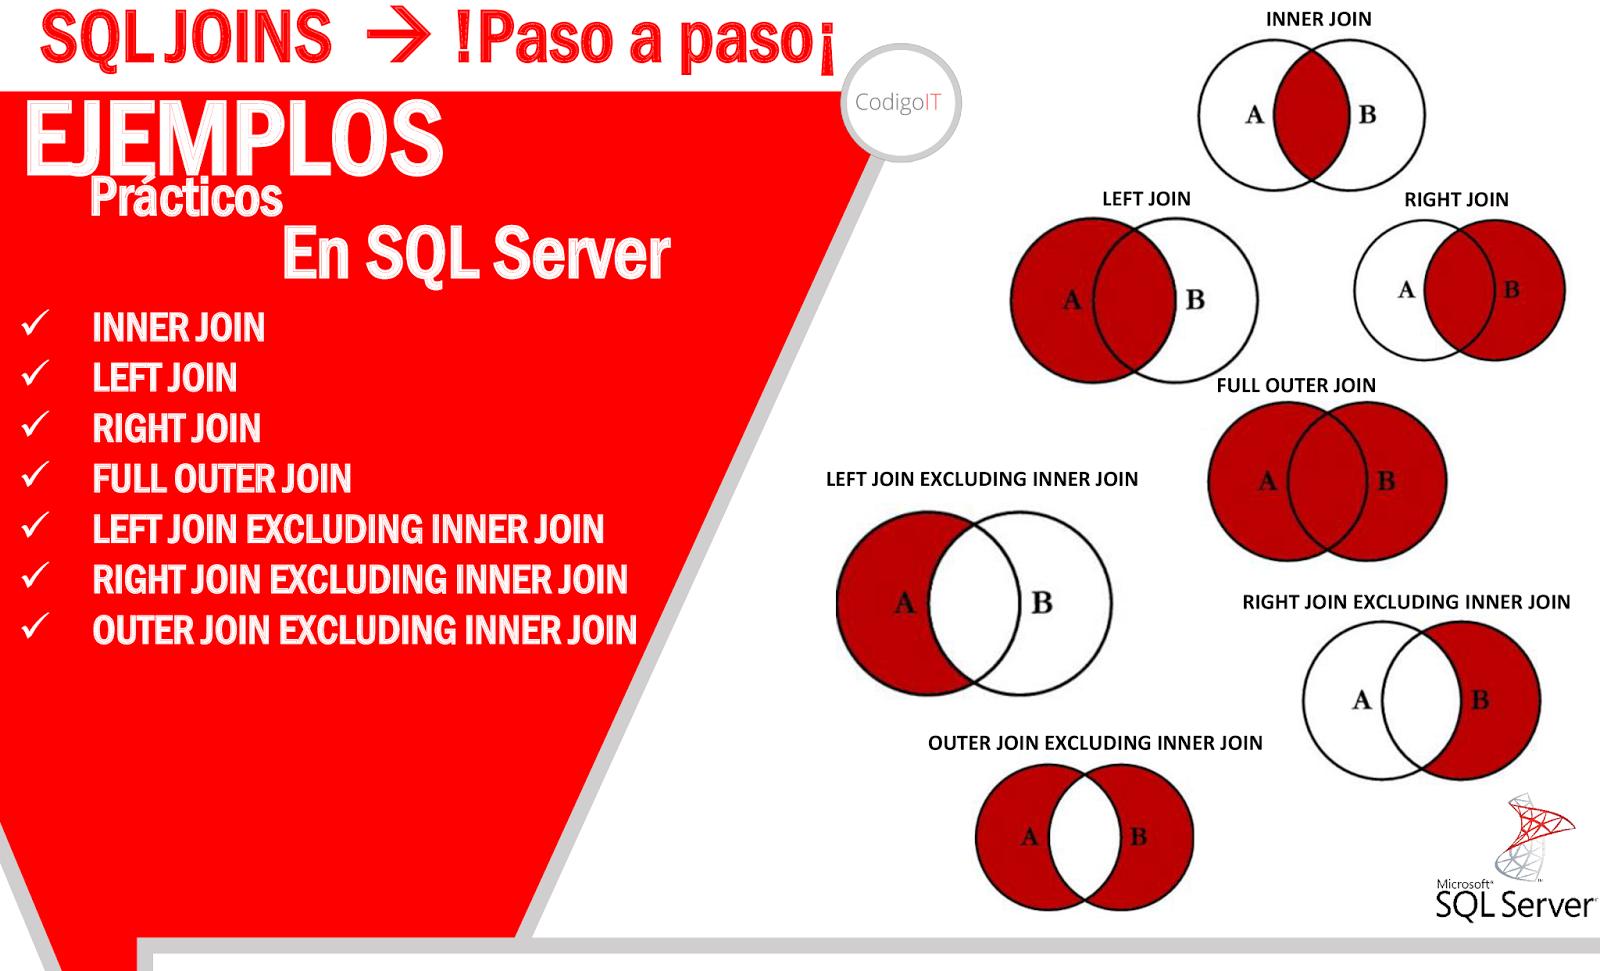 Sql joins ejemplos prcticos en sql server vdeo apuntes vdeo tutorial paso a paso donde se explica los sql join baditri Images